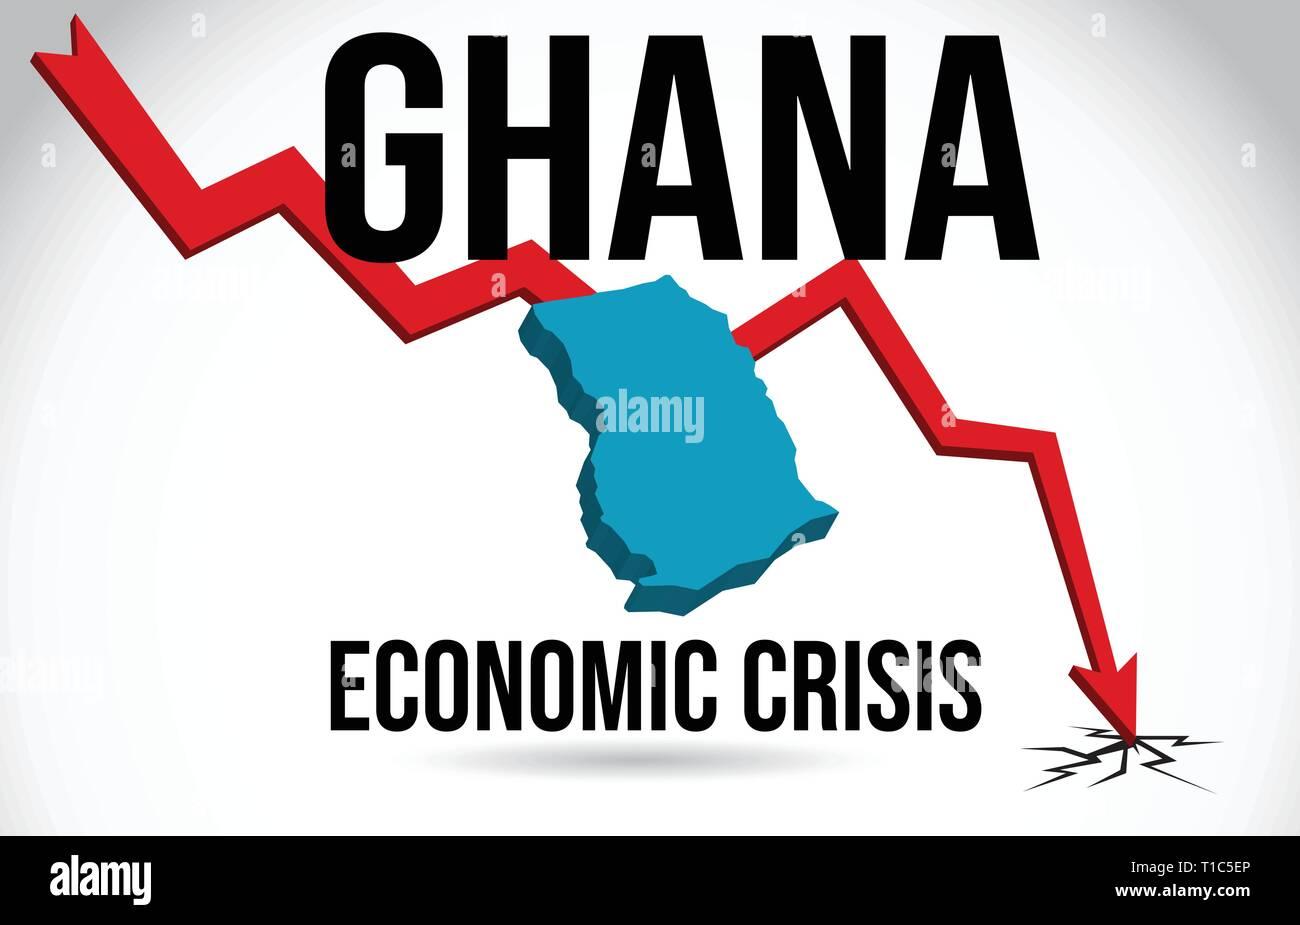 Ghana Map Financial Crisis Economic Collapse Market Crash Global Meltdown Vector Illustration. - Stock Vector